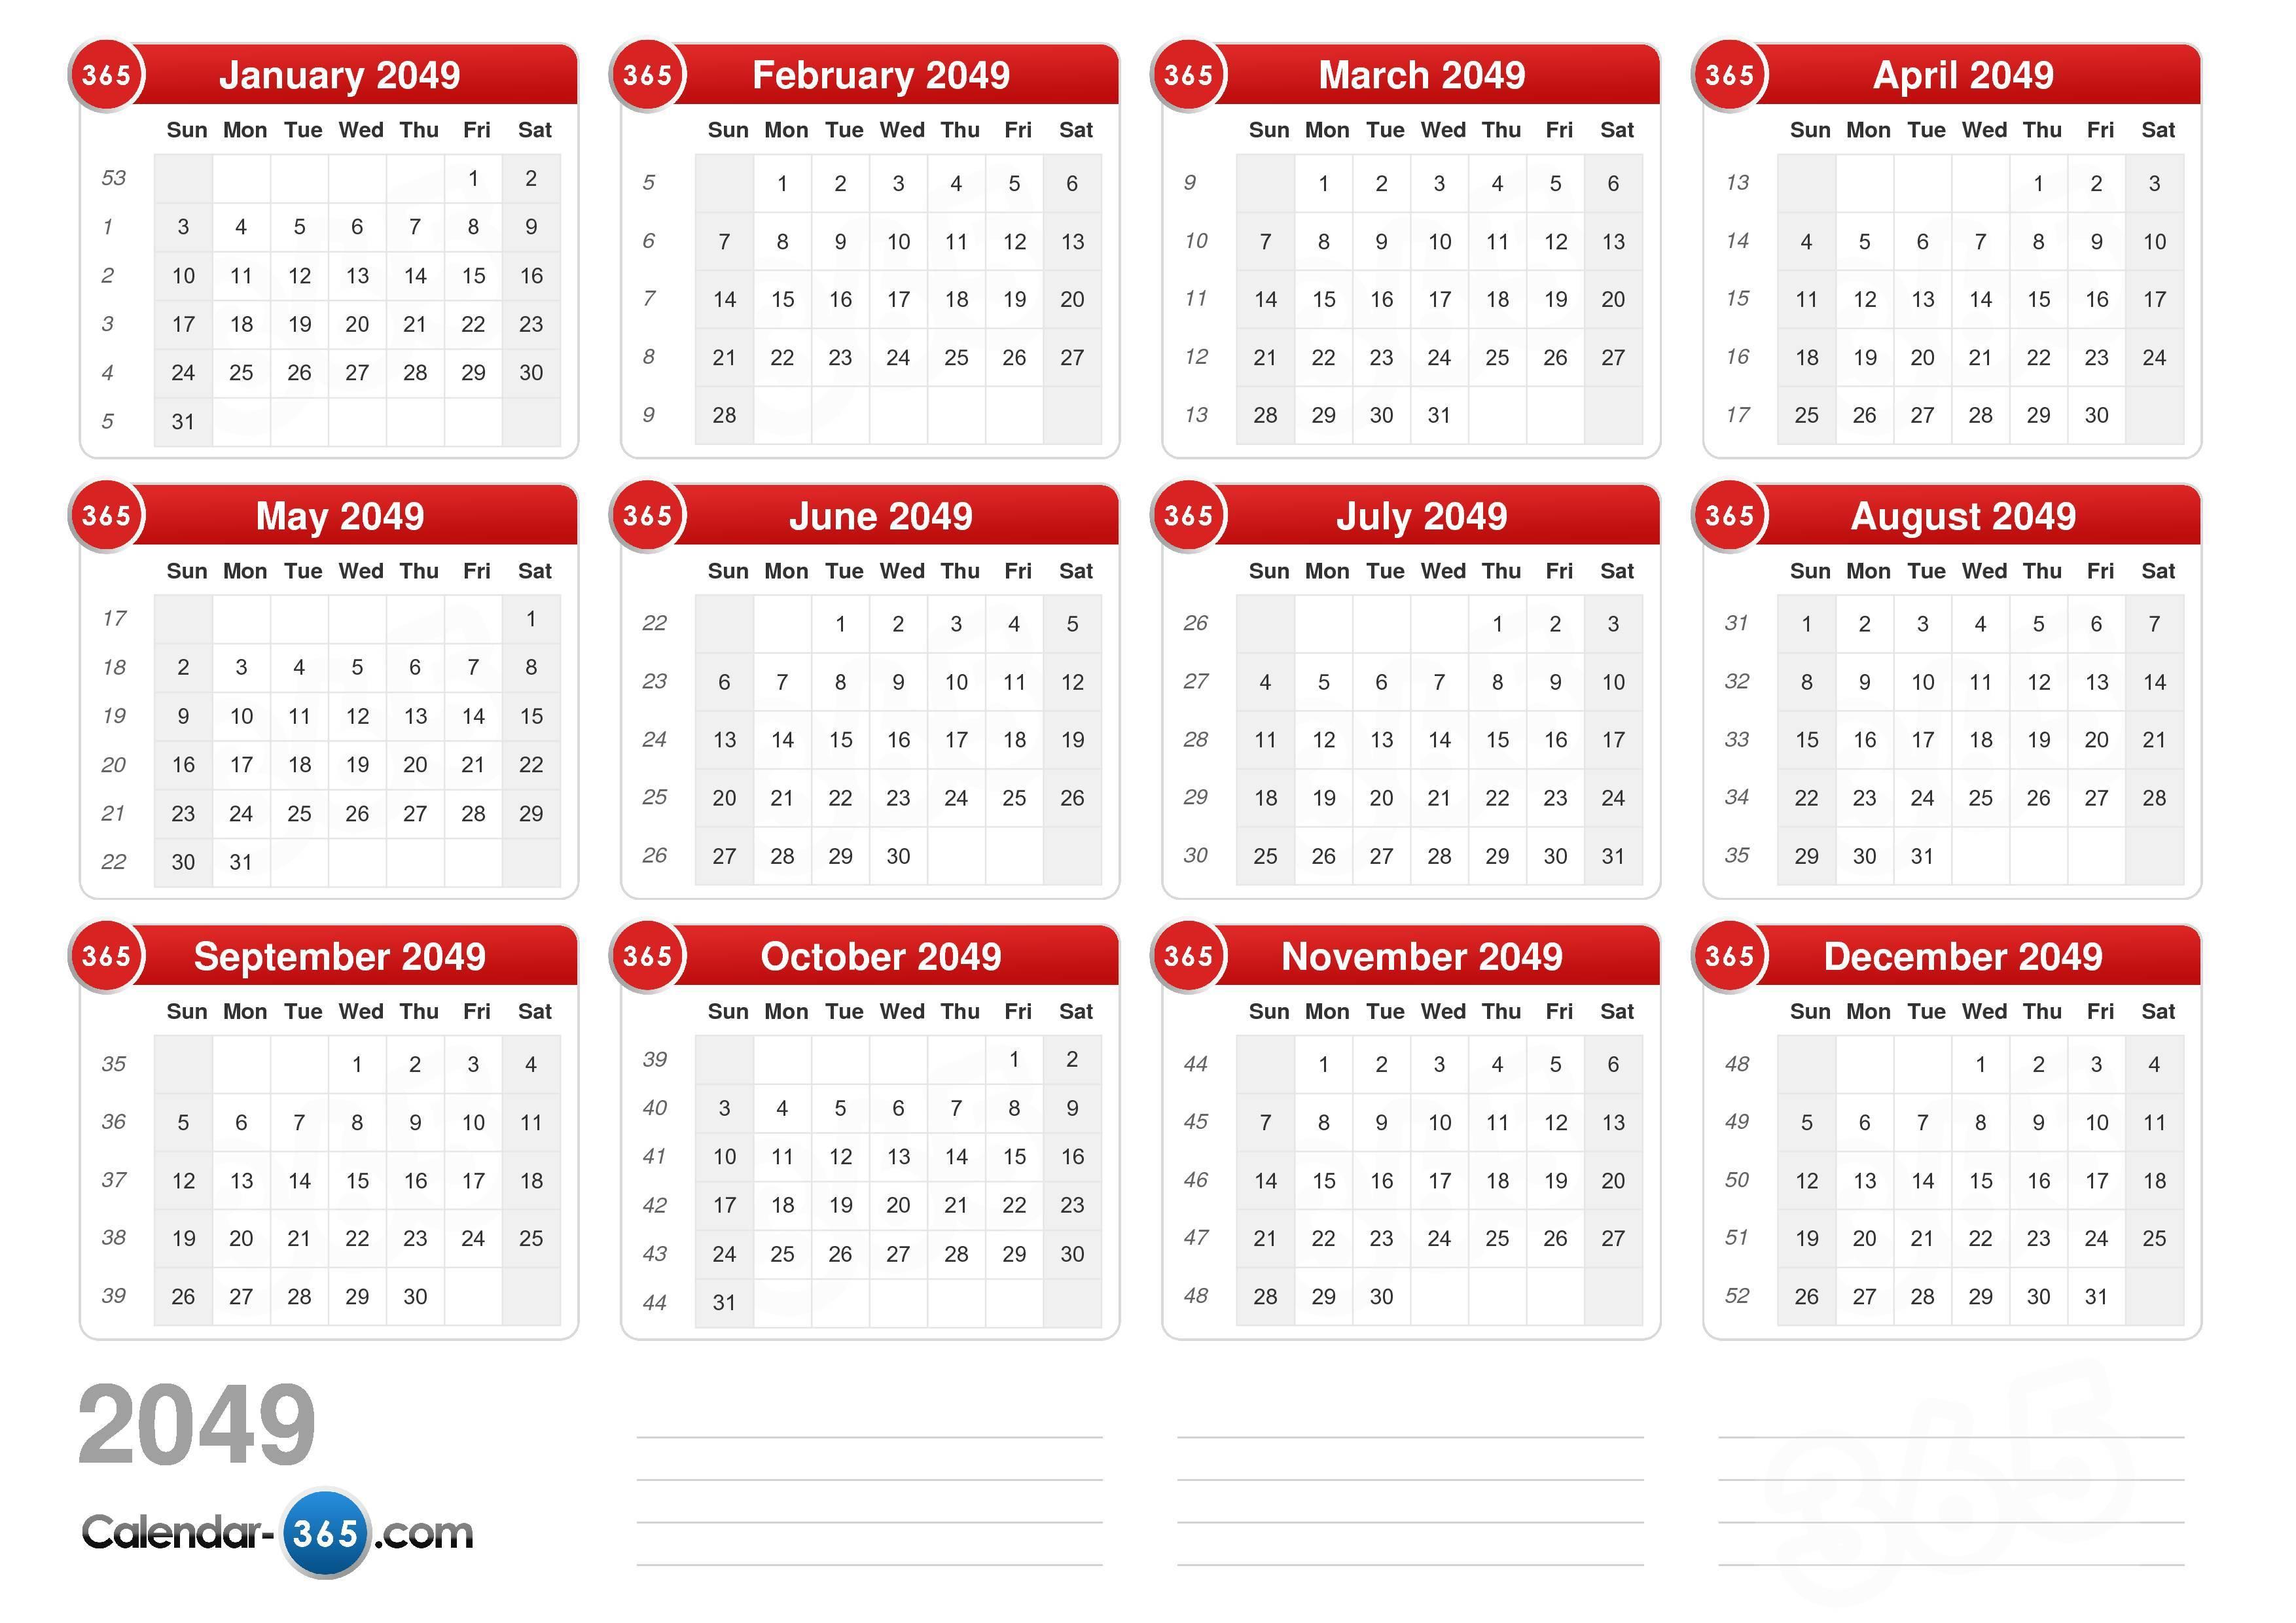 Online Calendars To Download Get Organized With These Free Online Calendars 2049 Calendar